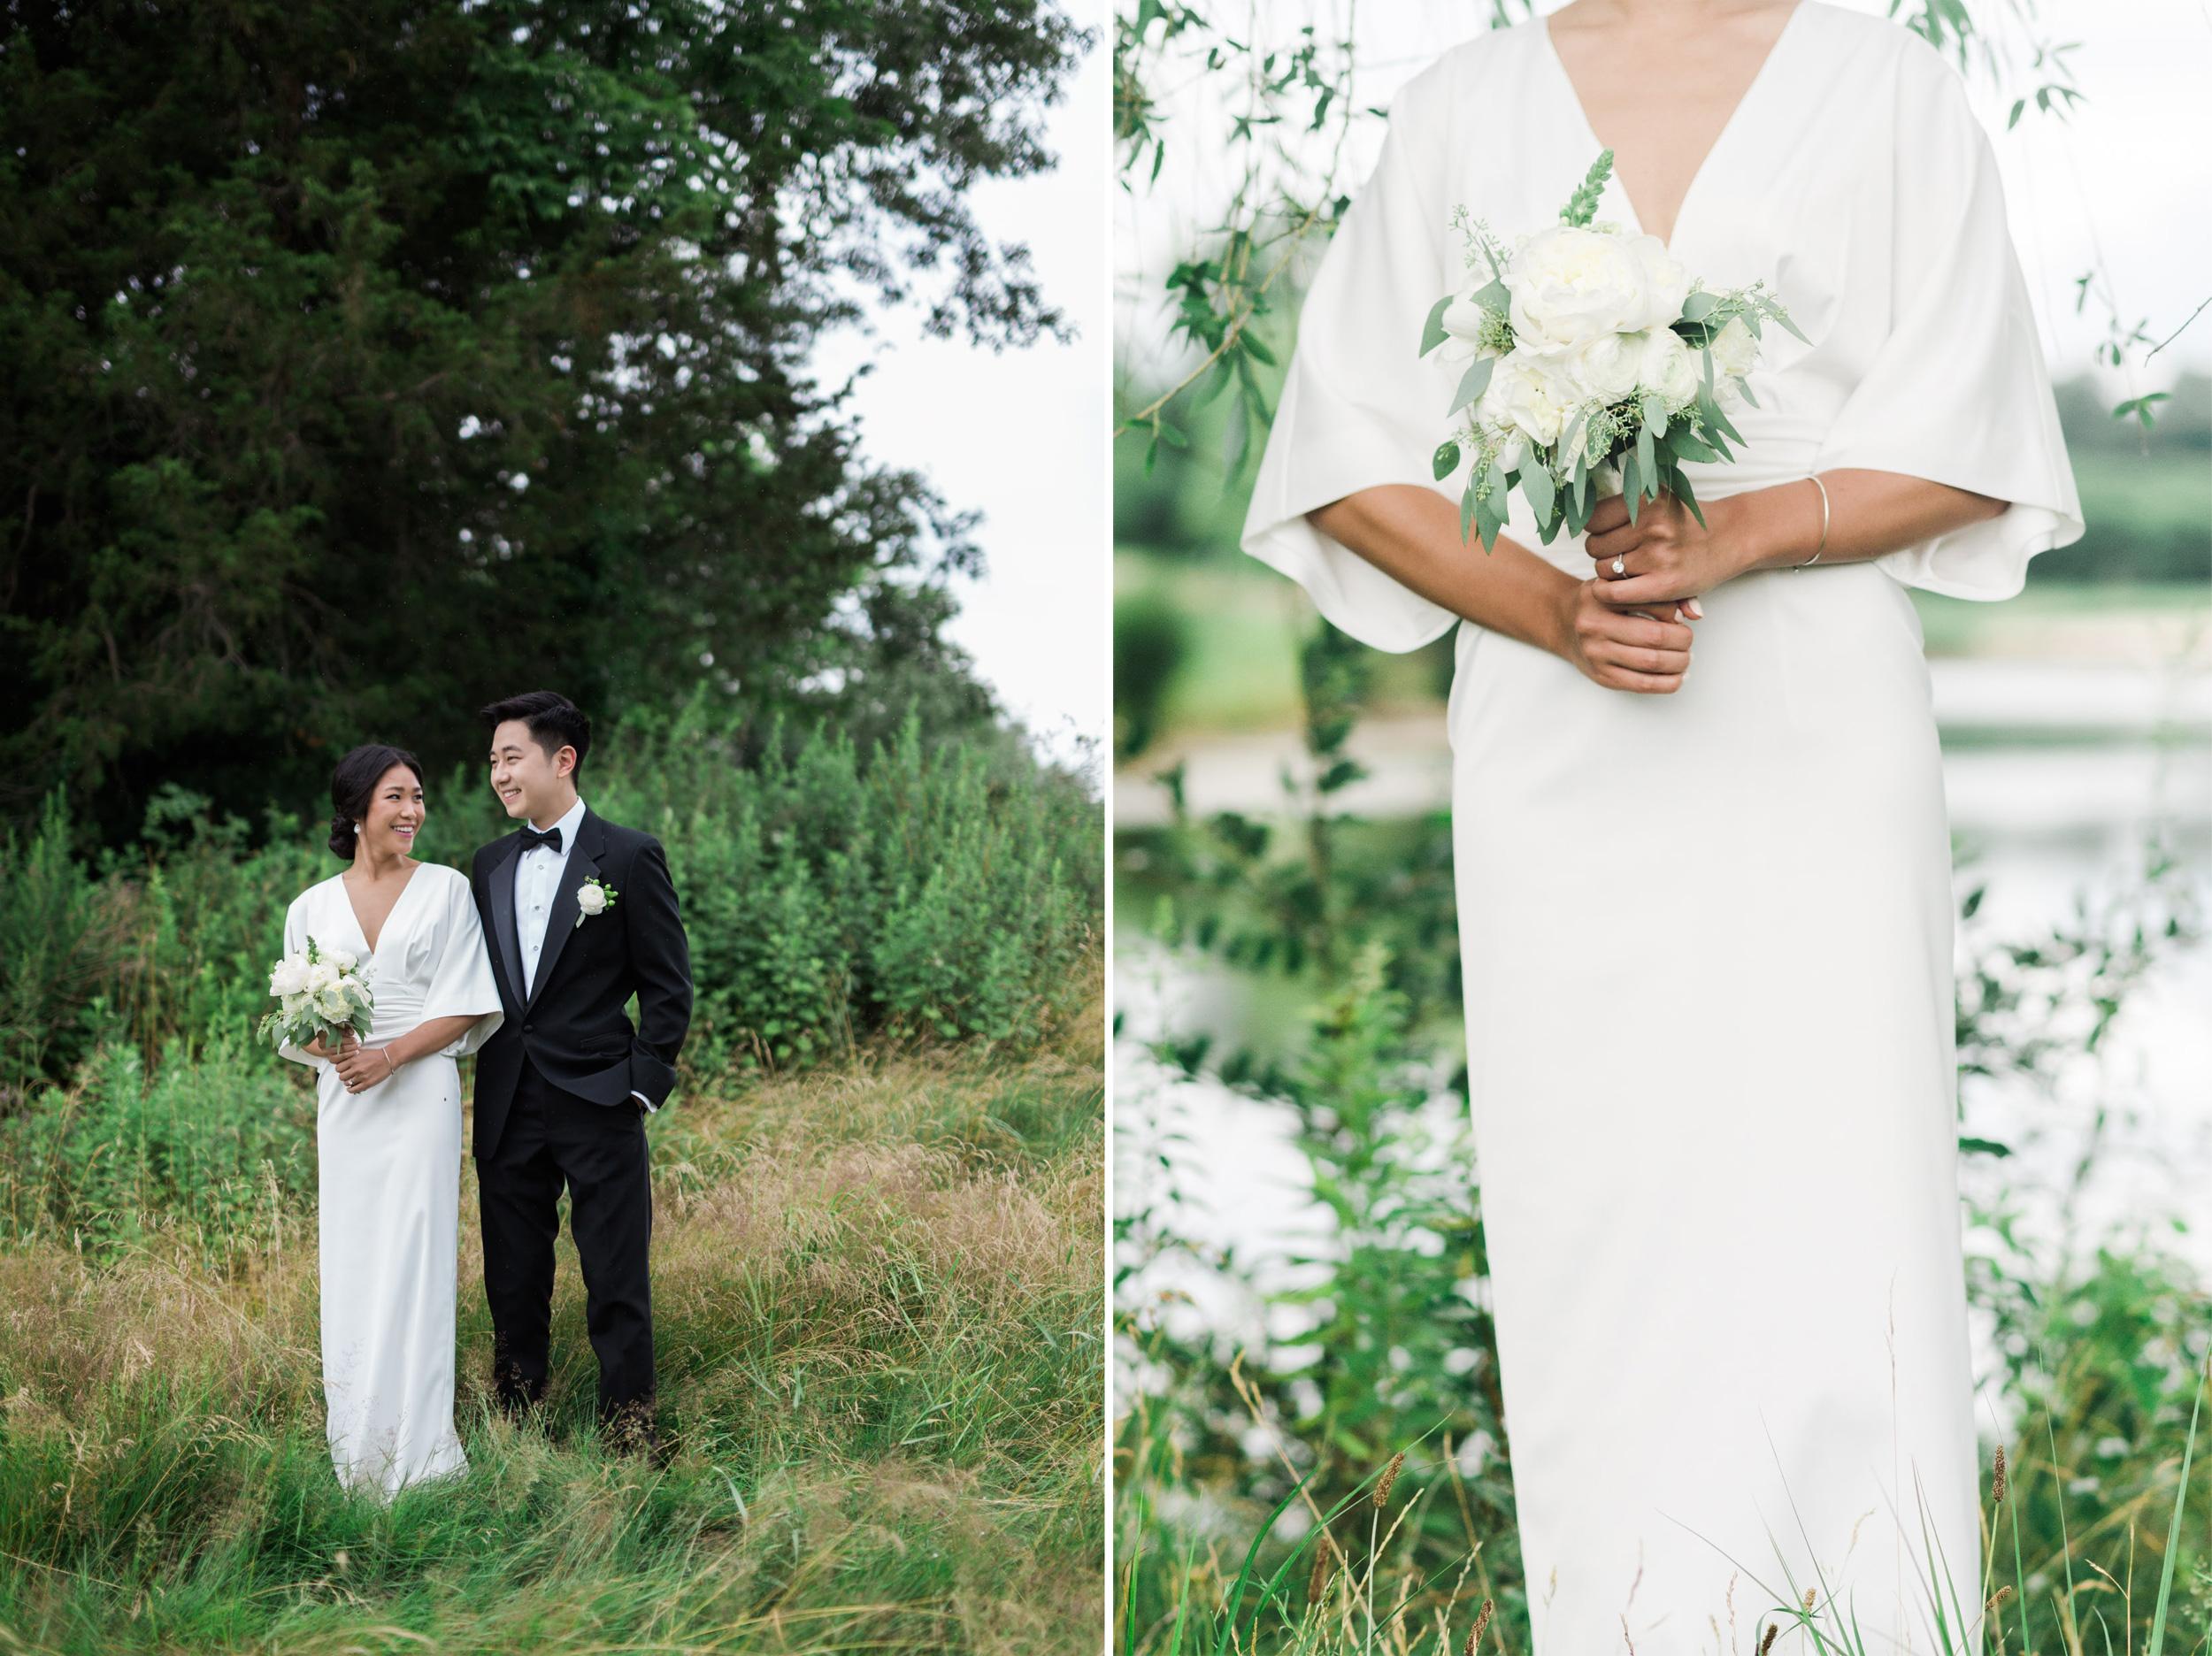 jean-arnold-wedding-0005.jpg